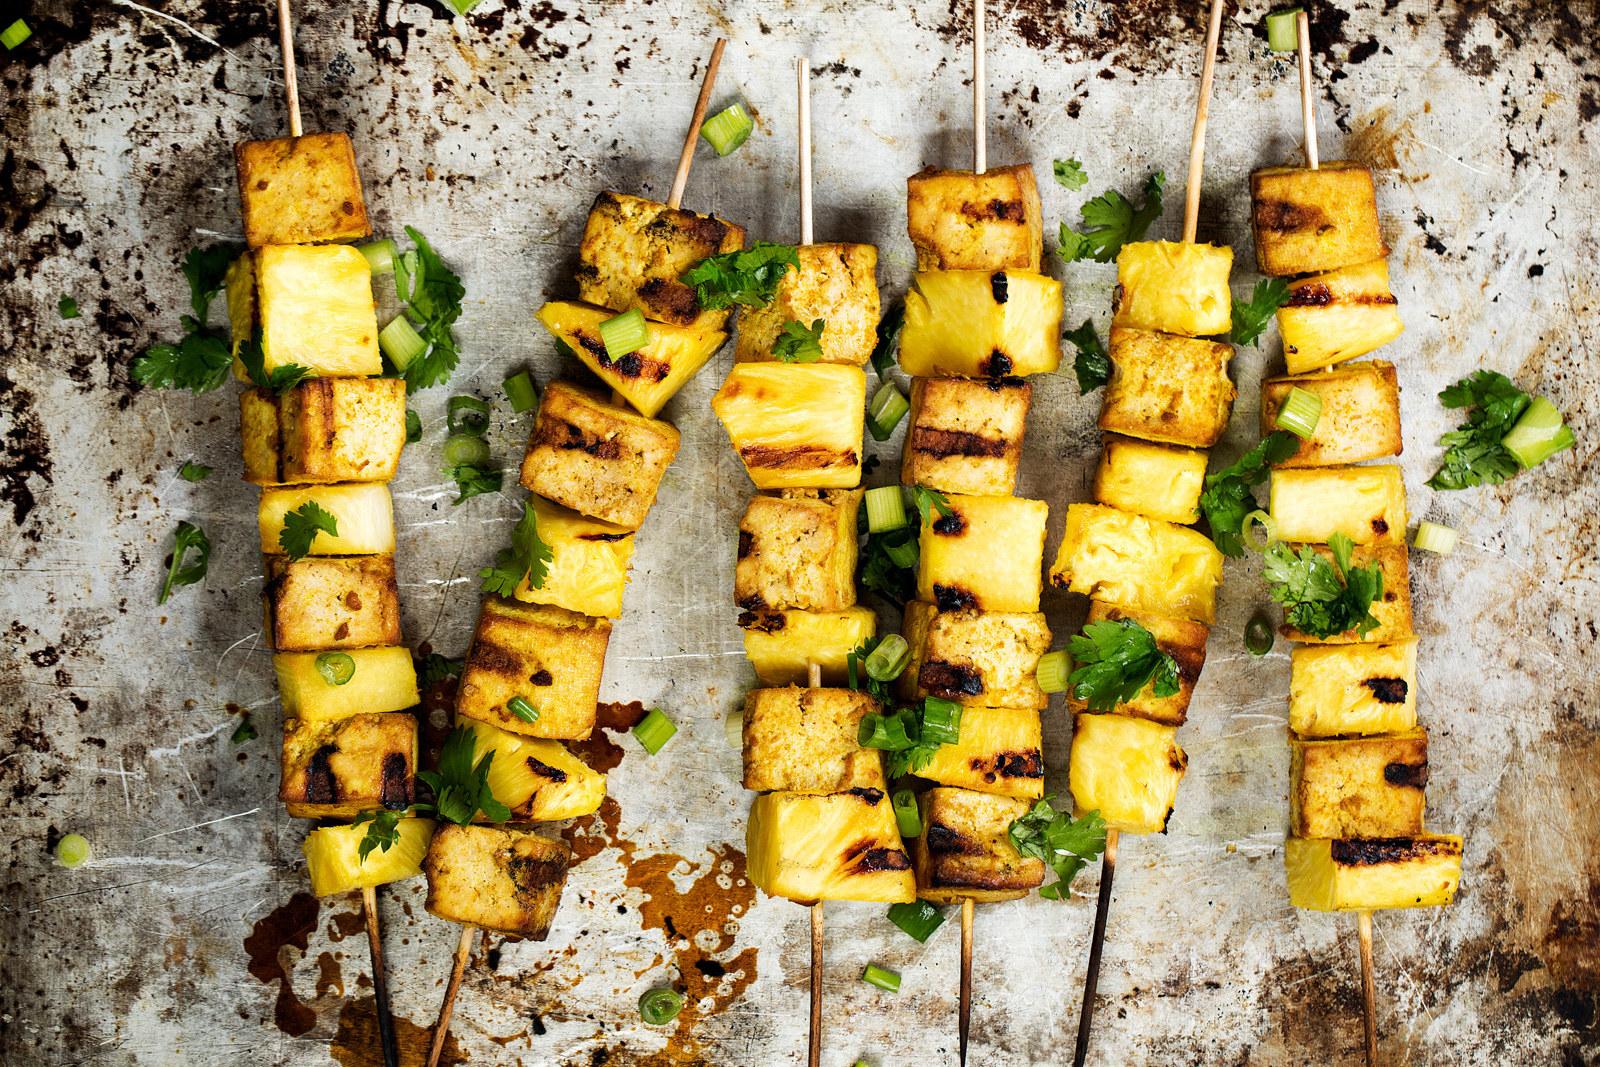 This recipe uses tamari rather than soy sauce, making it gluten free.